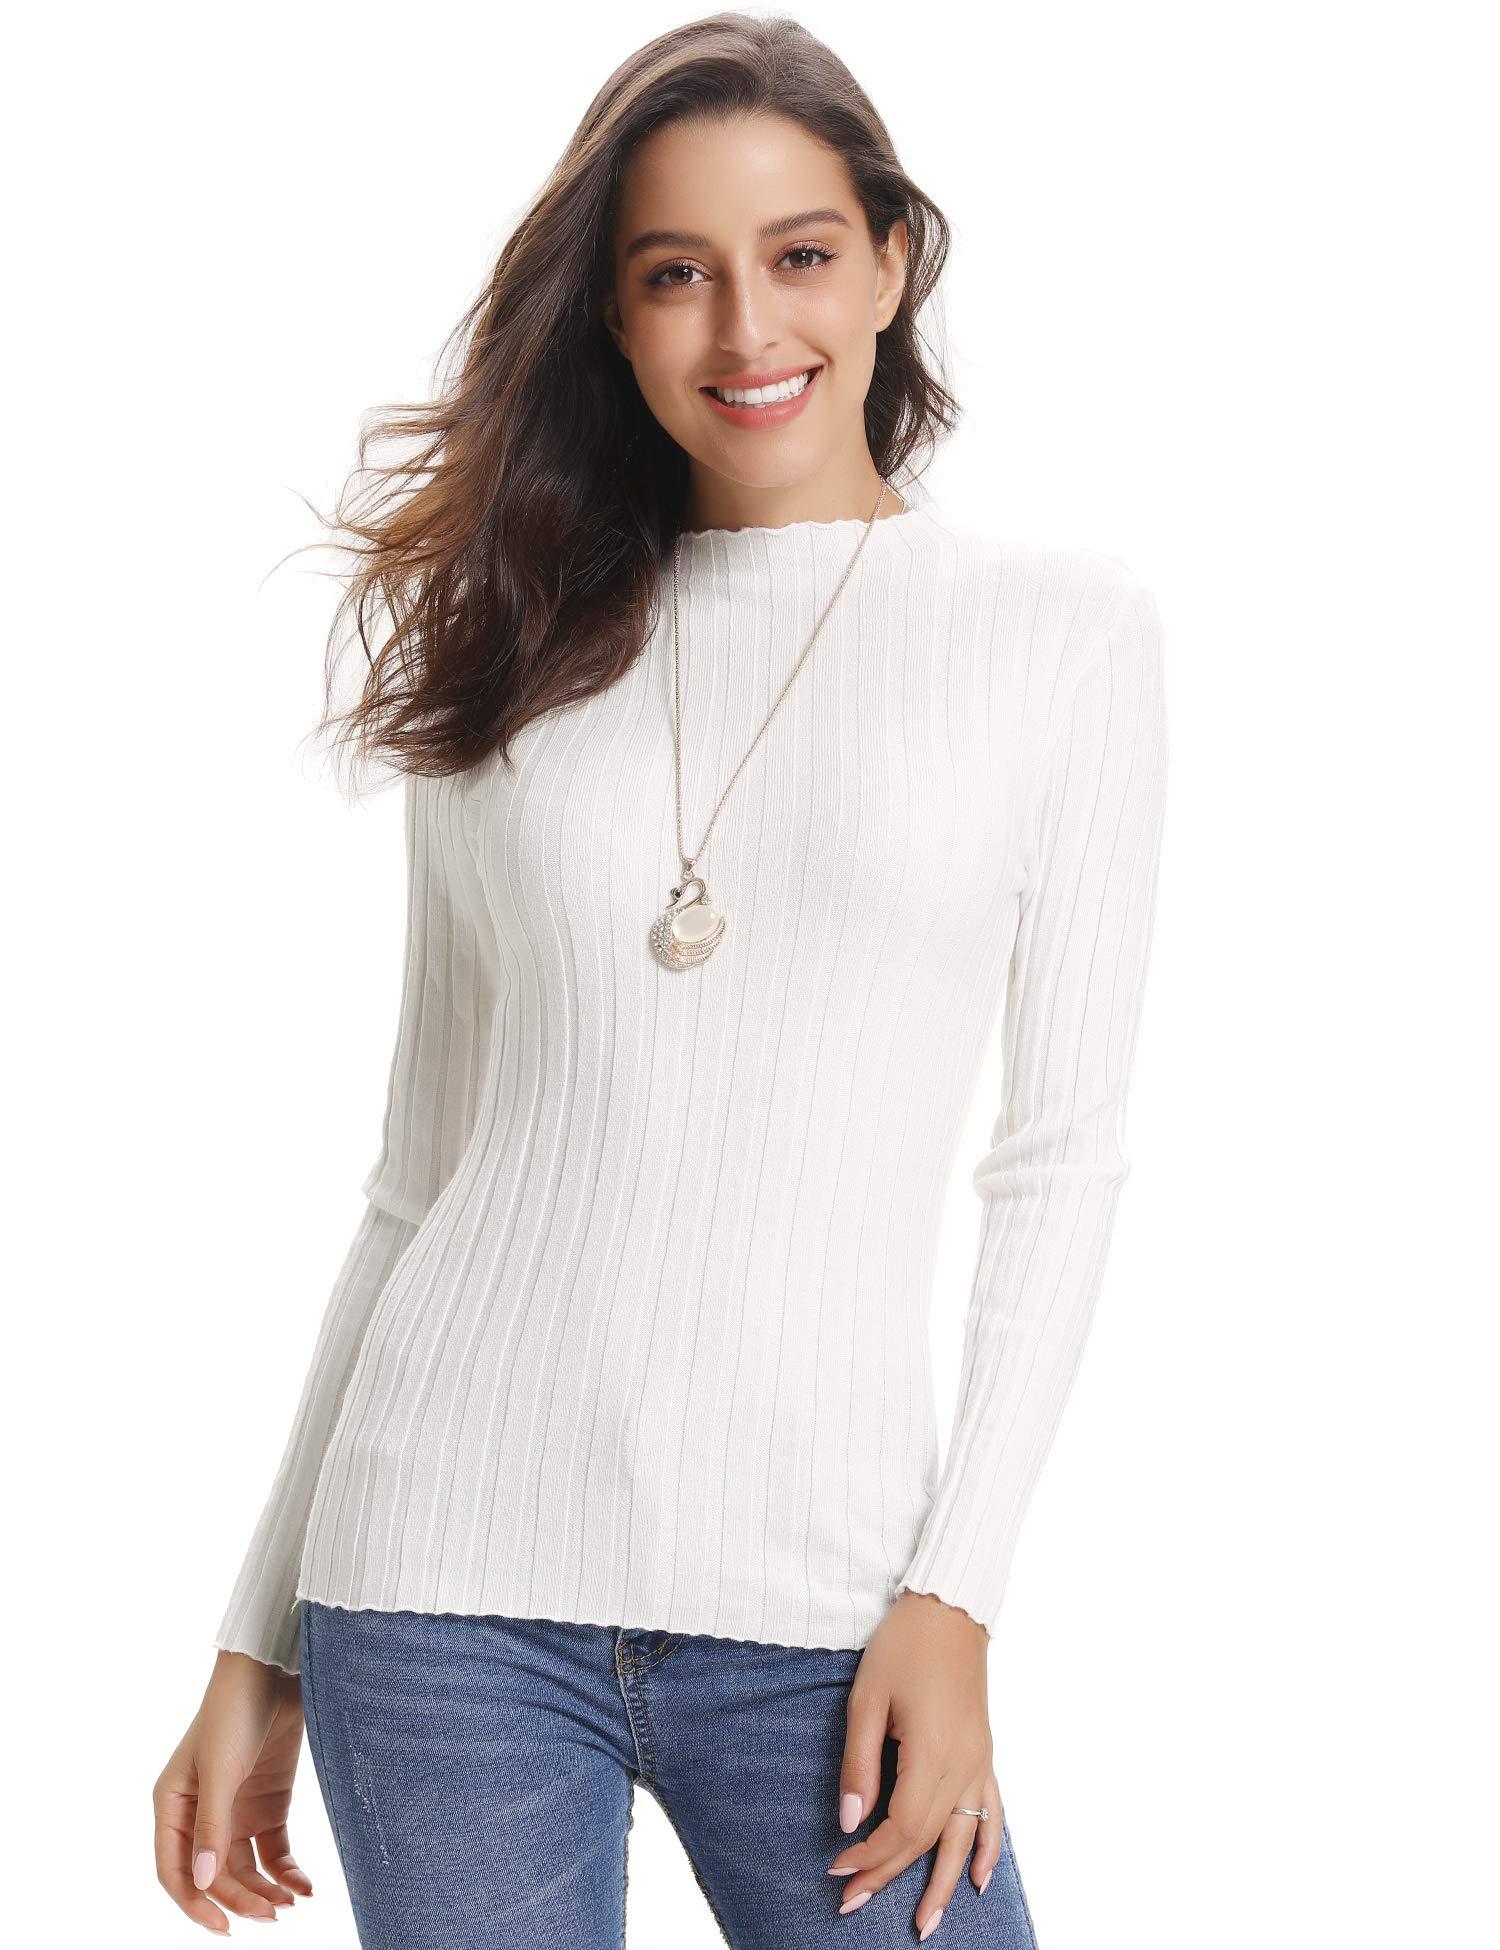 Abollria Women\'s Ribbed Turtleneck Long Sleeve Sweater Tops